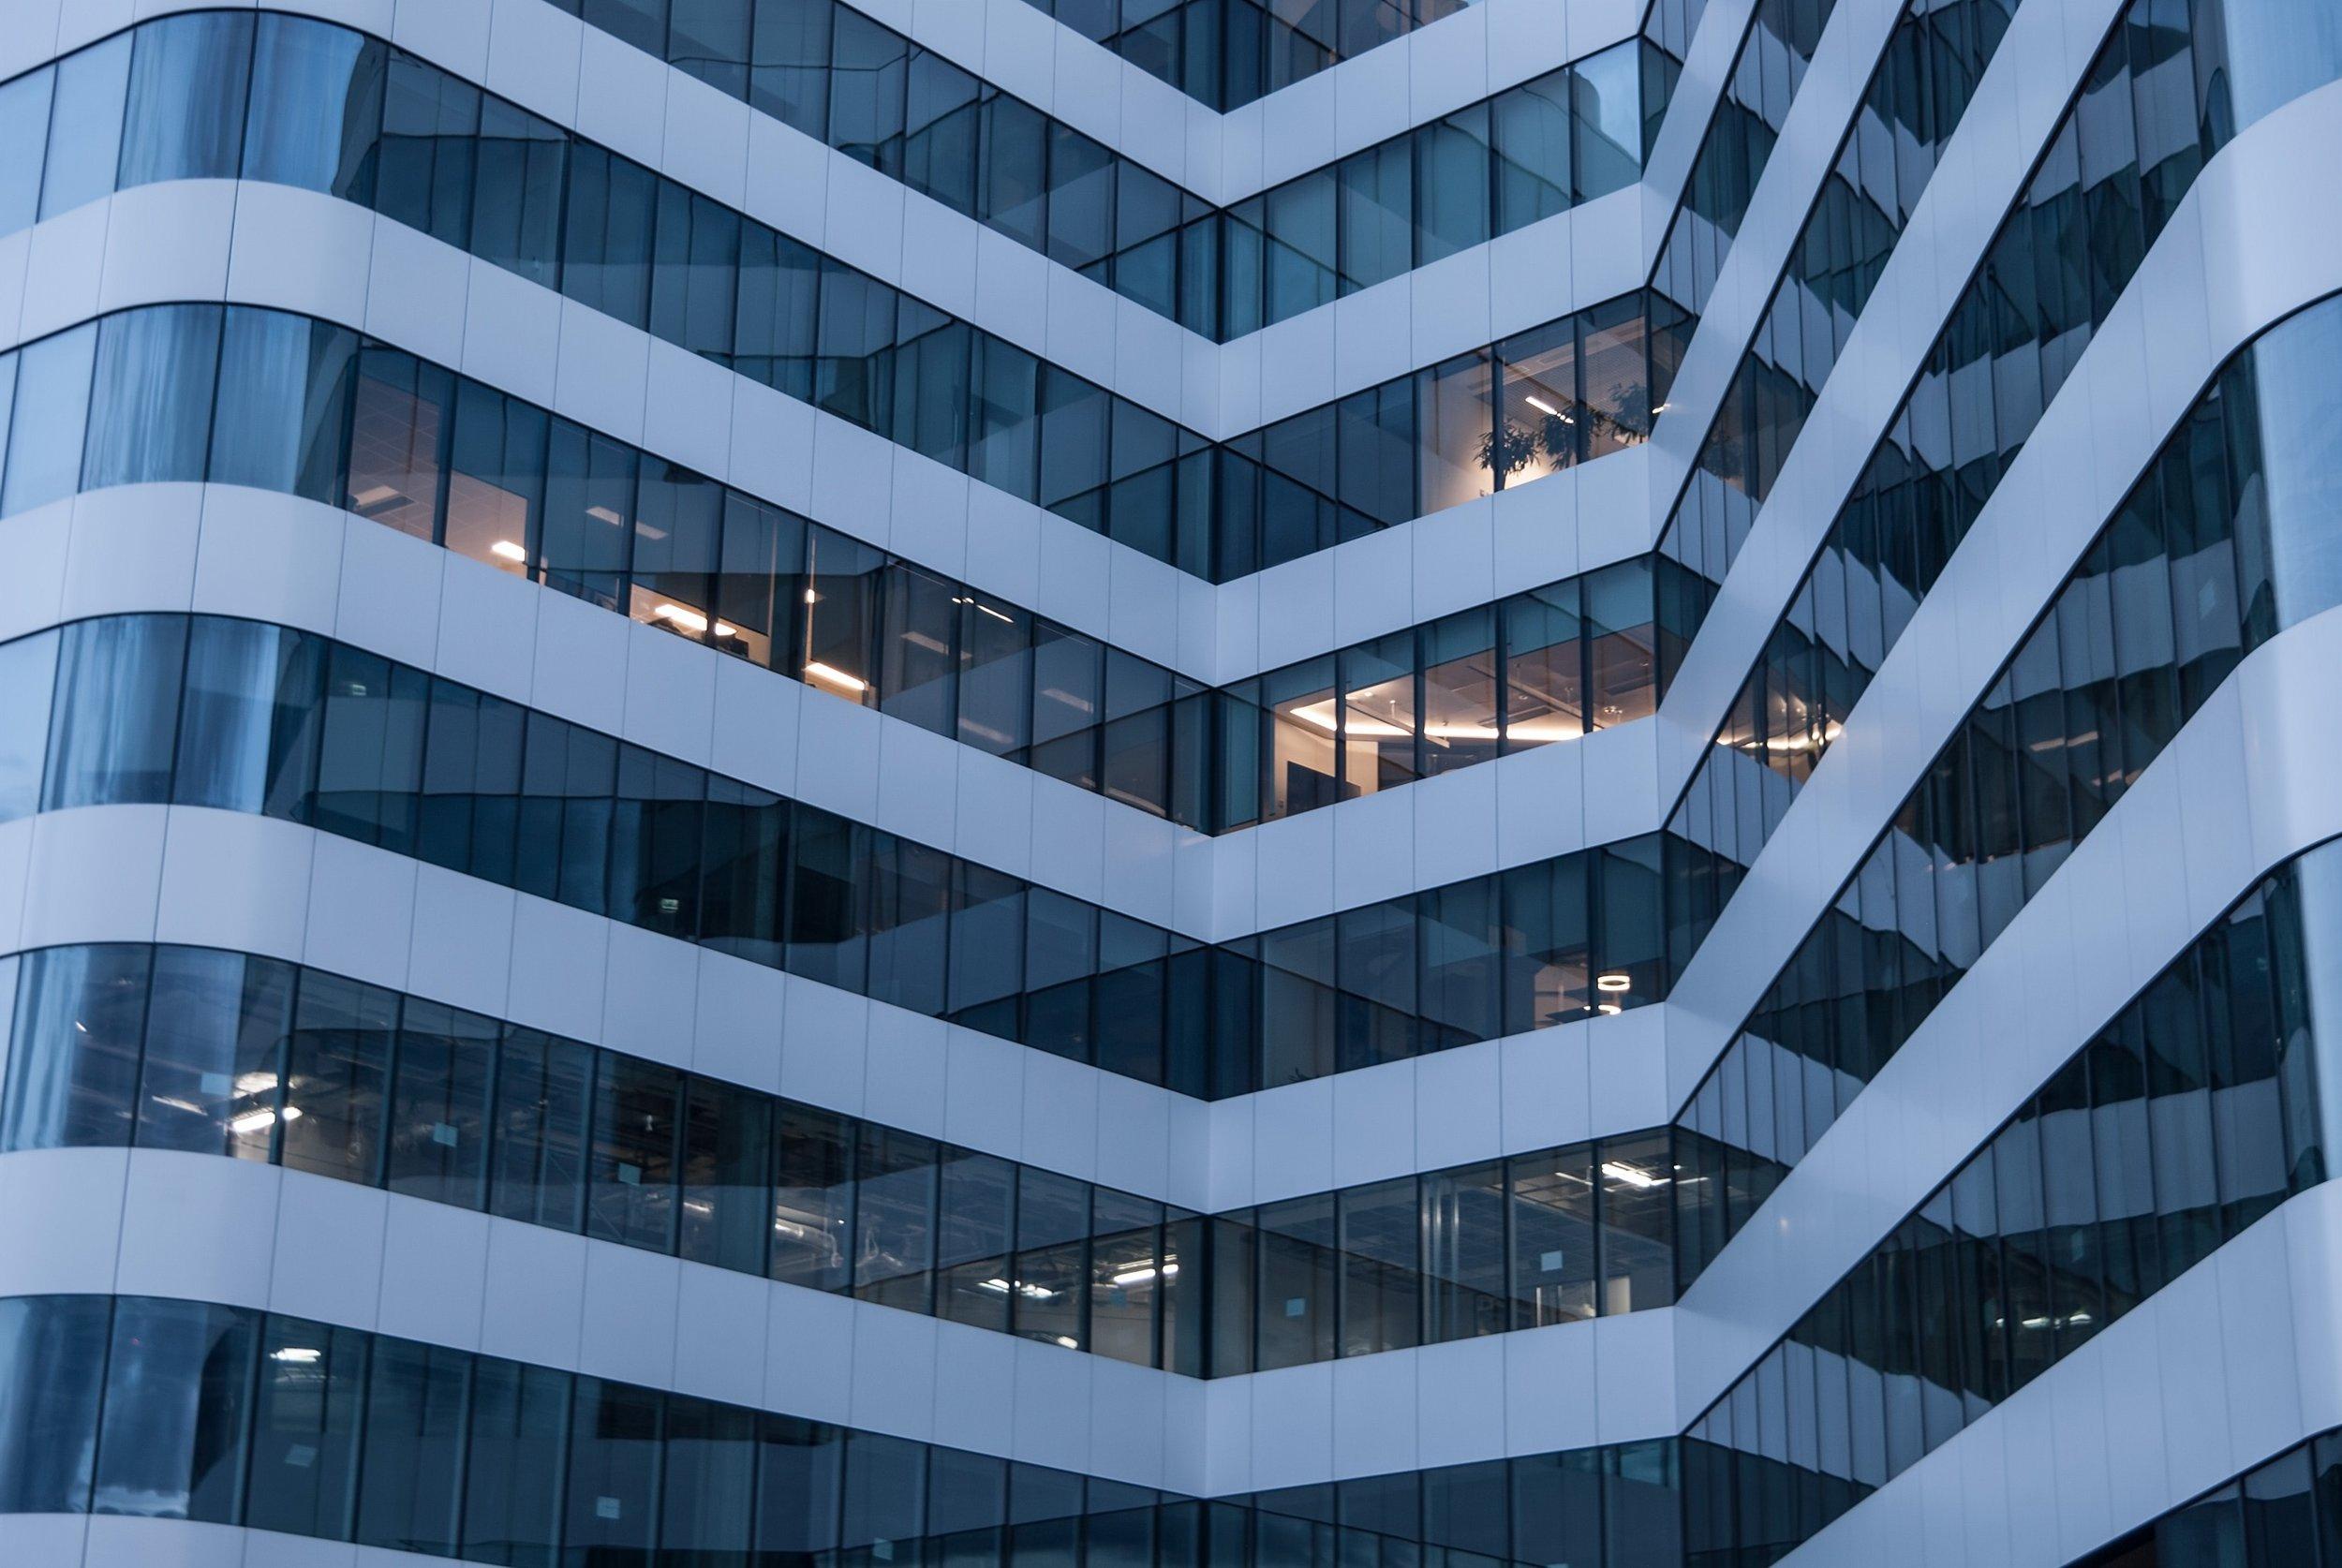 architectural-design-architecture-building-417352 (1).jpg